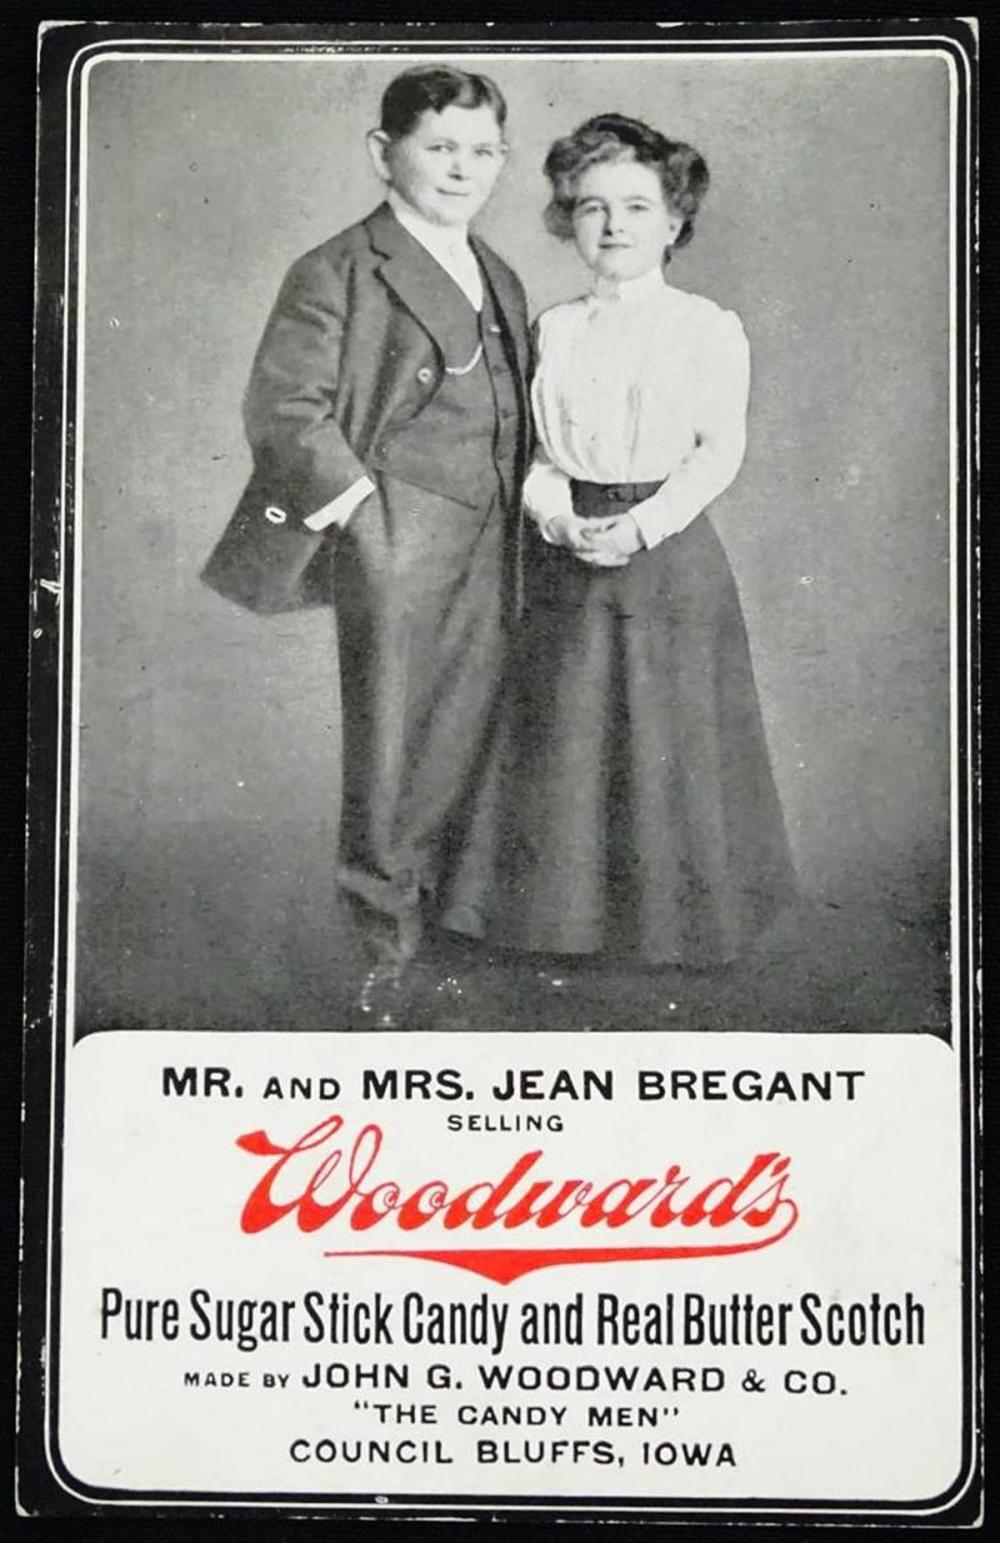 MR. AND MRS. JEAN BREGANT ADVERTISING CARD